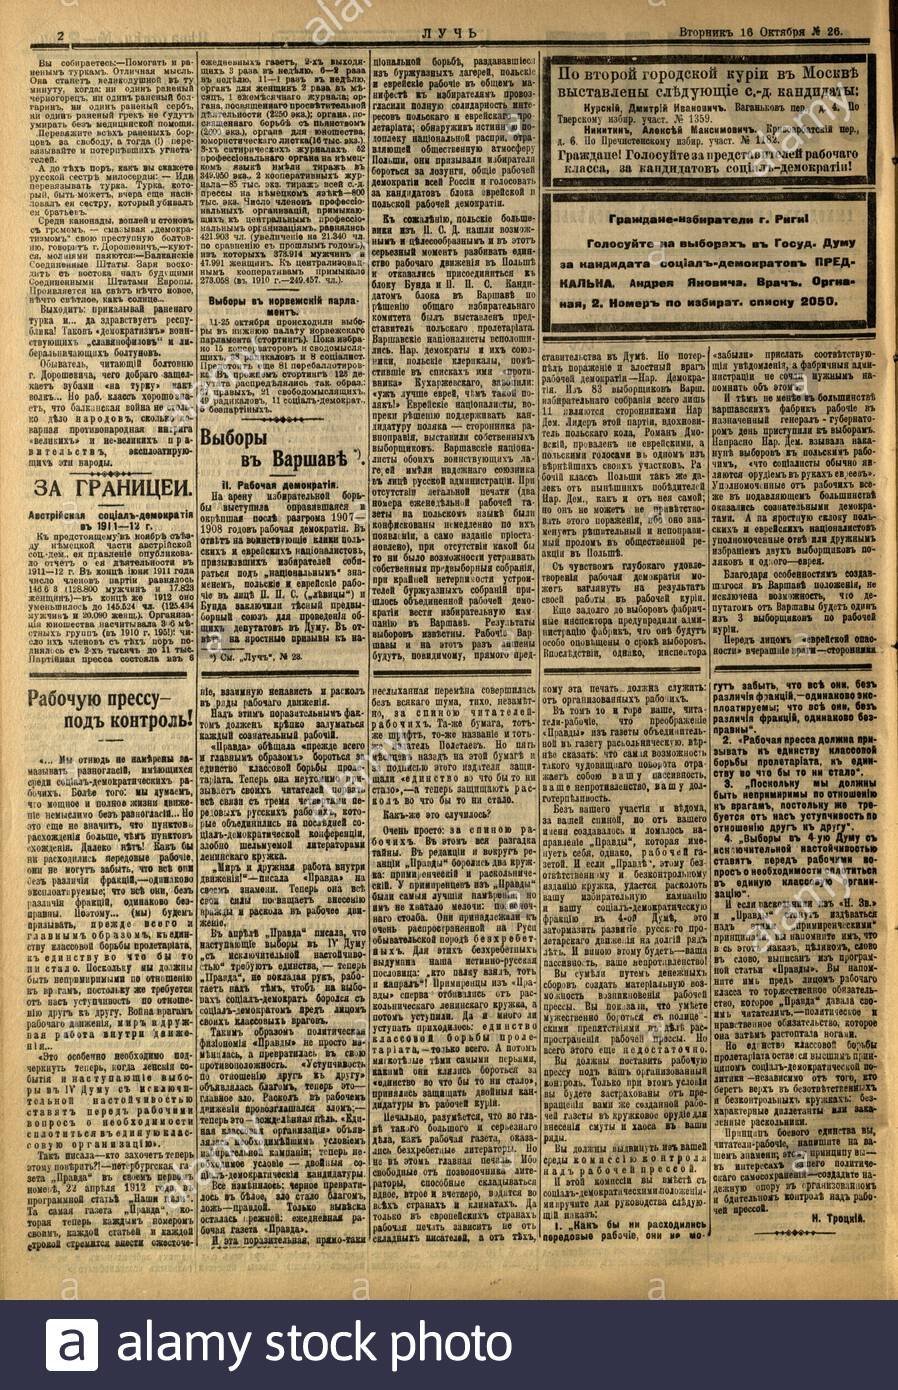 Русский: Луч № 26 (Газета, 16 Октября 1912); 16 October 1912 In Mexican Calendar With Saints Names